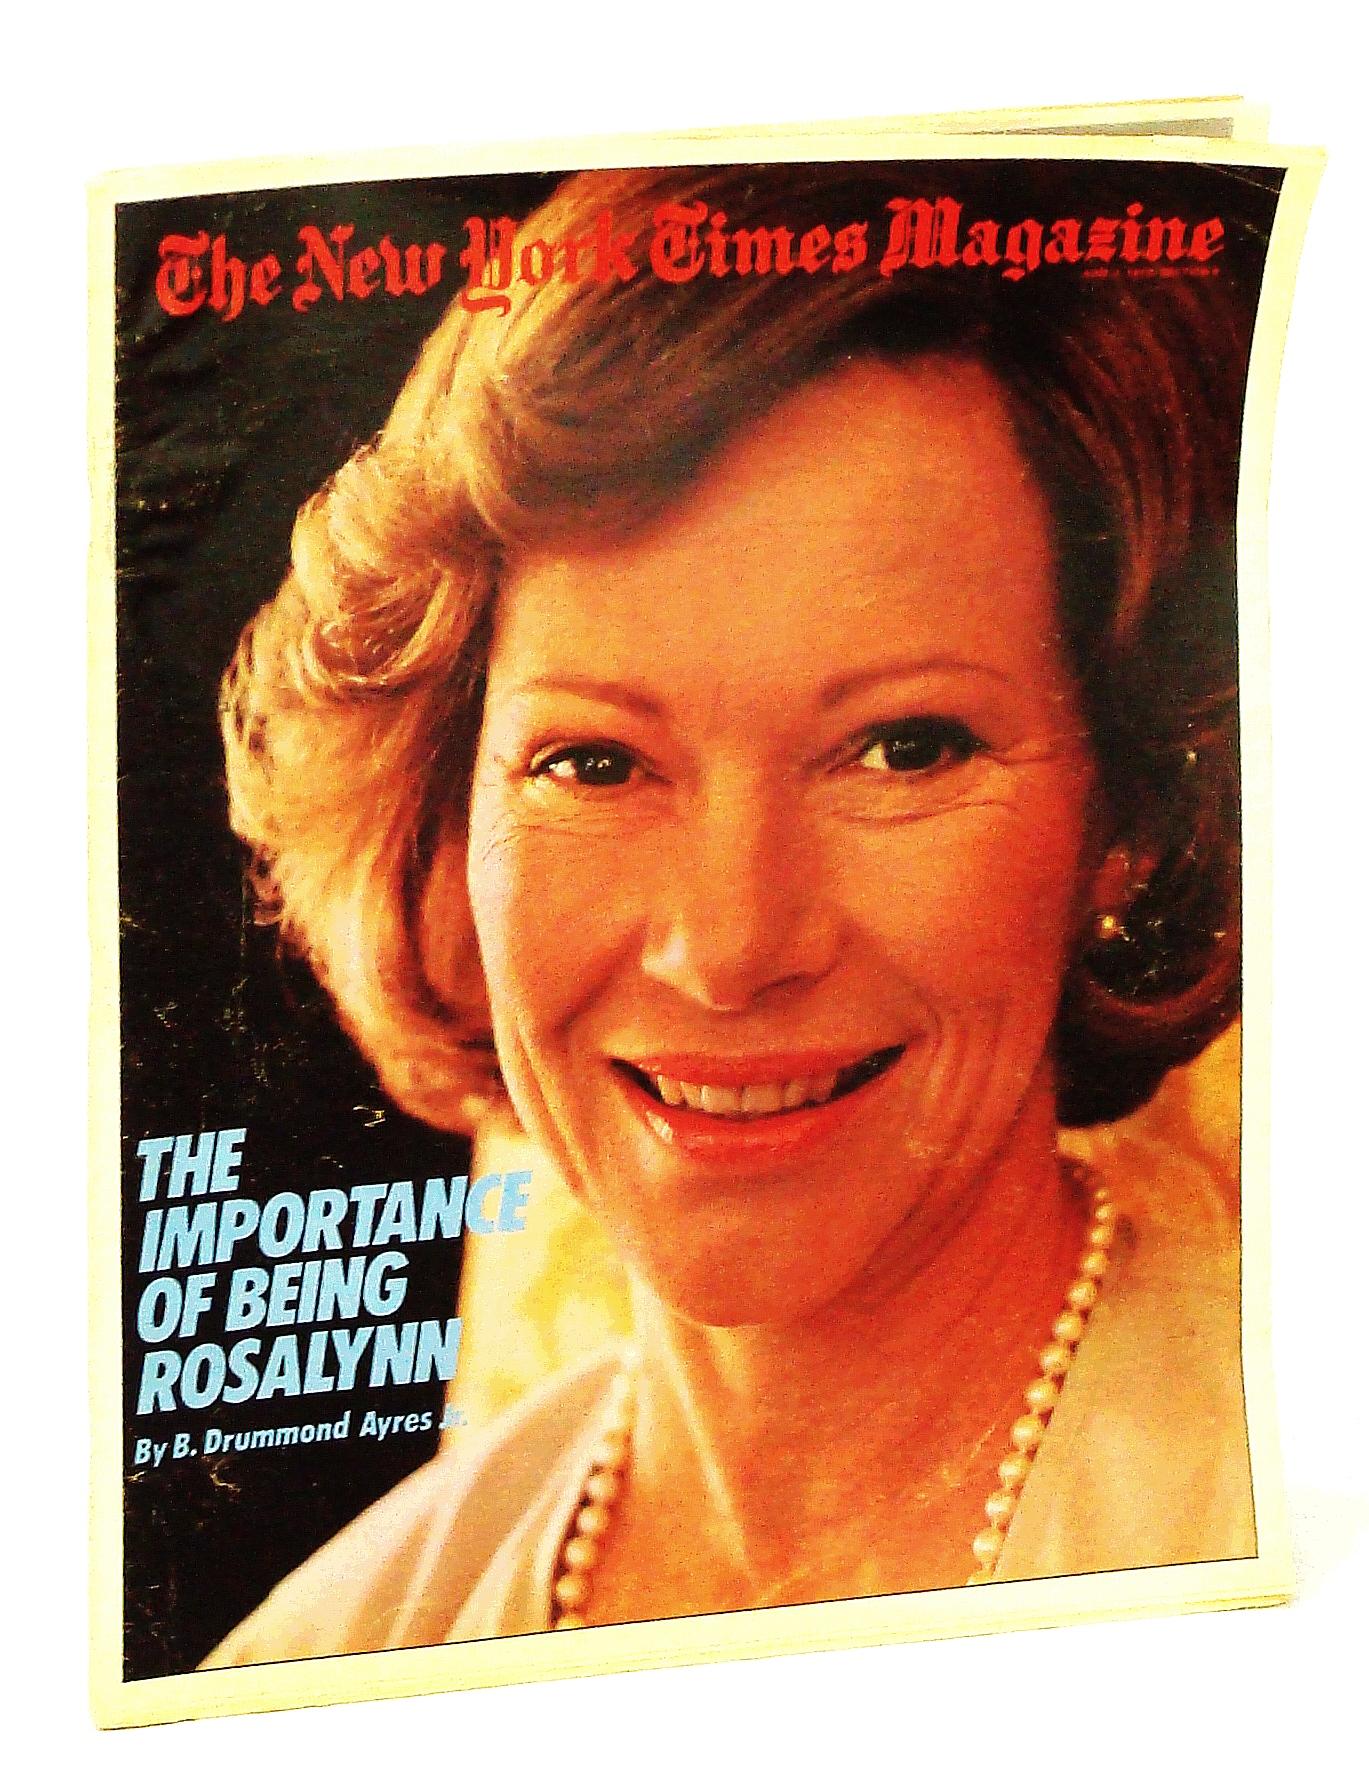 Image for The New York Times Magazine, June 3, 1979: Rosalynn Carter Cover Photo